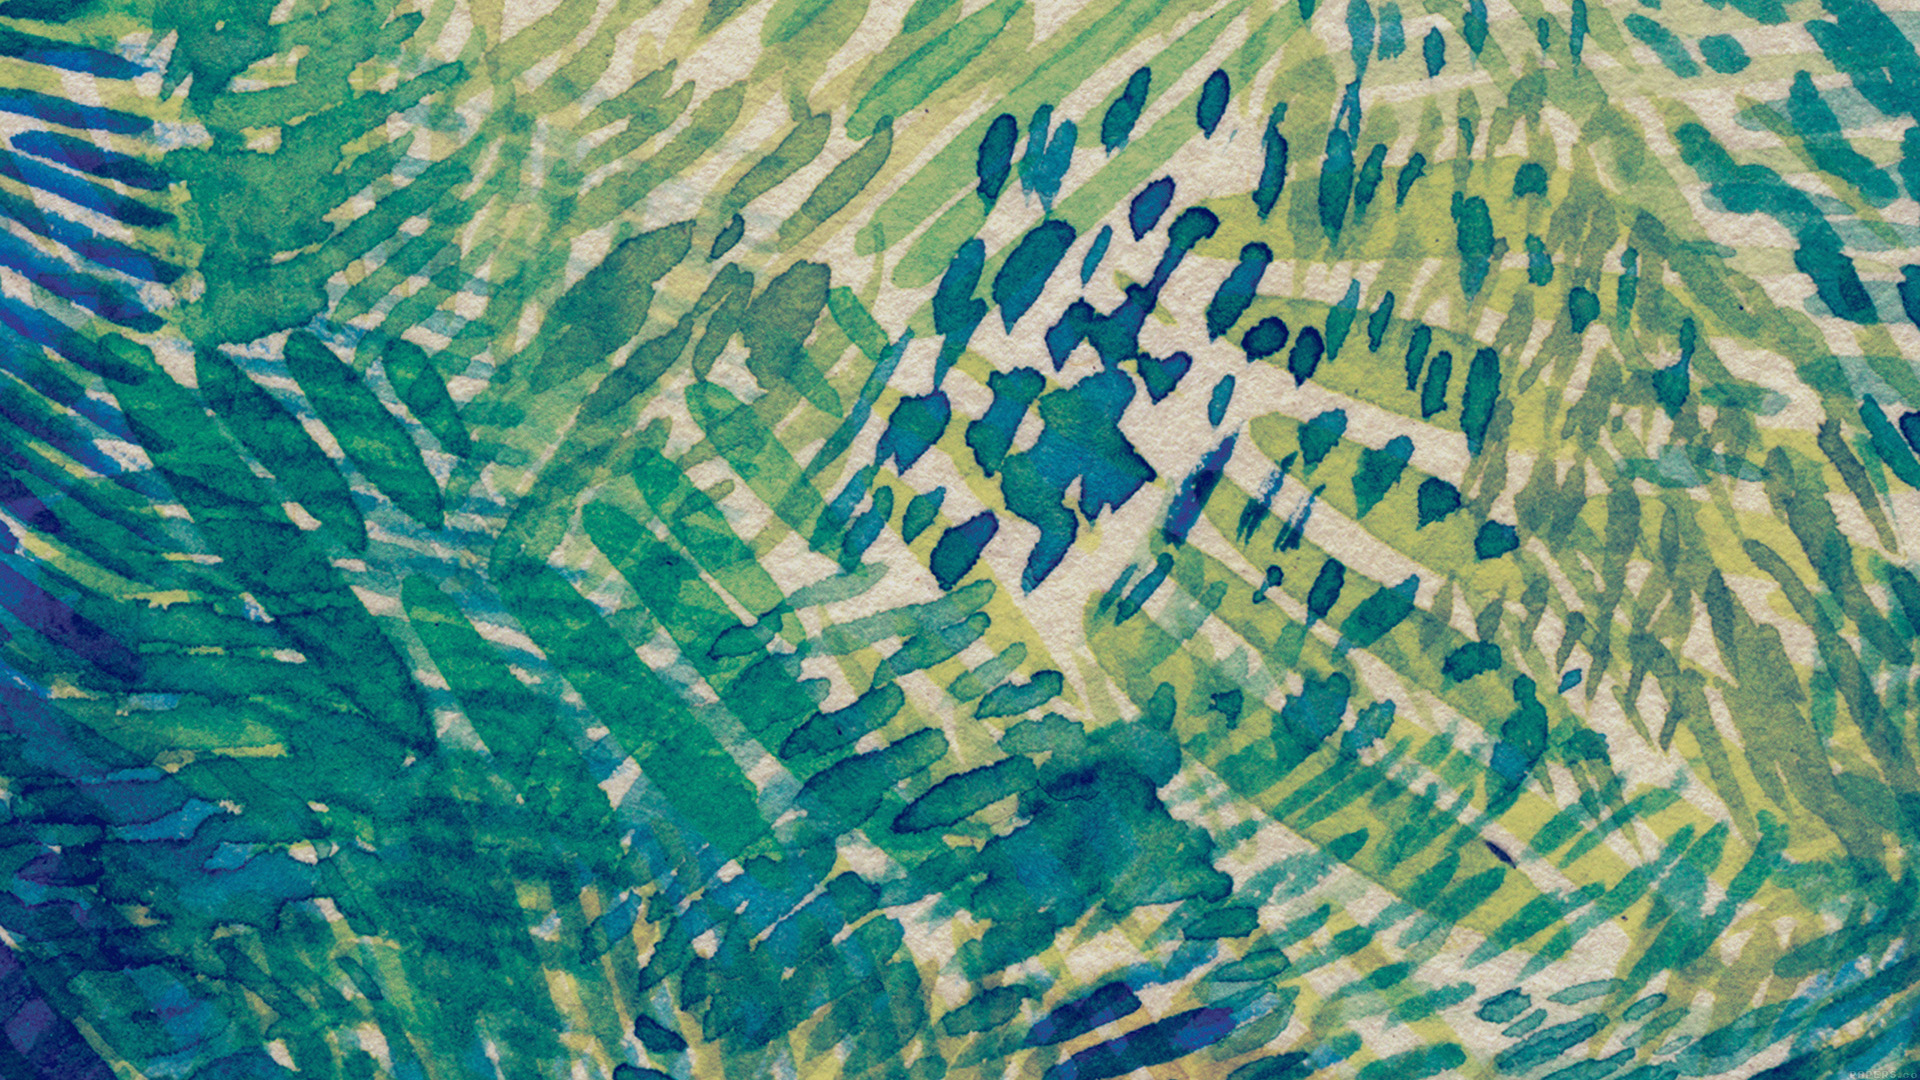 Cute Cactus Wallpaper Macbook Wallpaper For Desktop Laptop Vh93 Spring Art Dark Blue